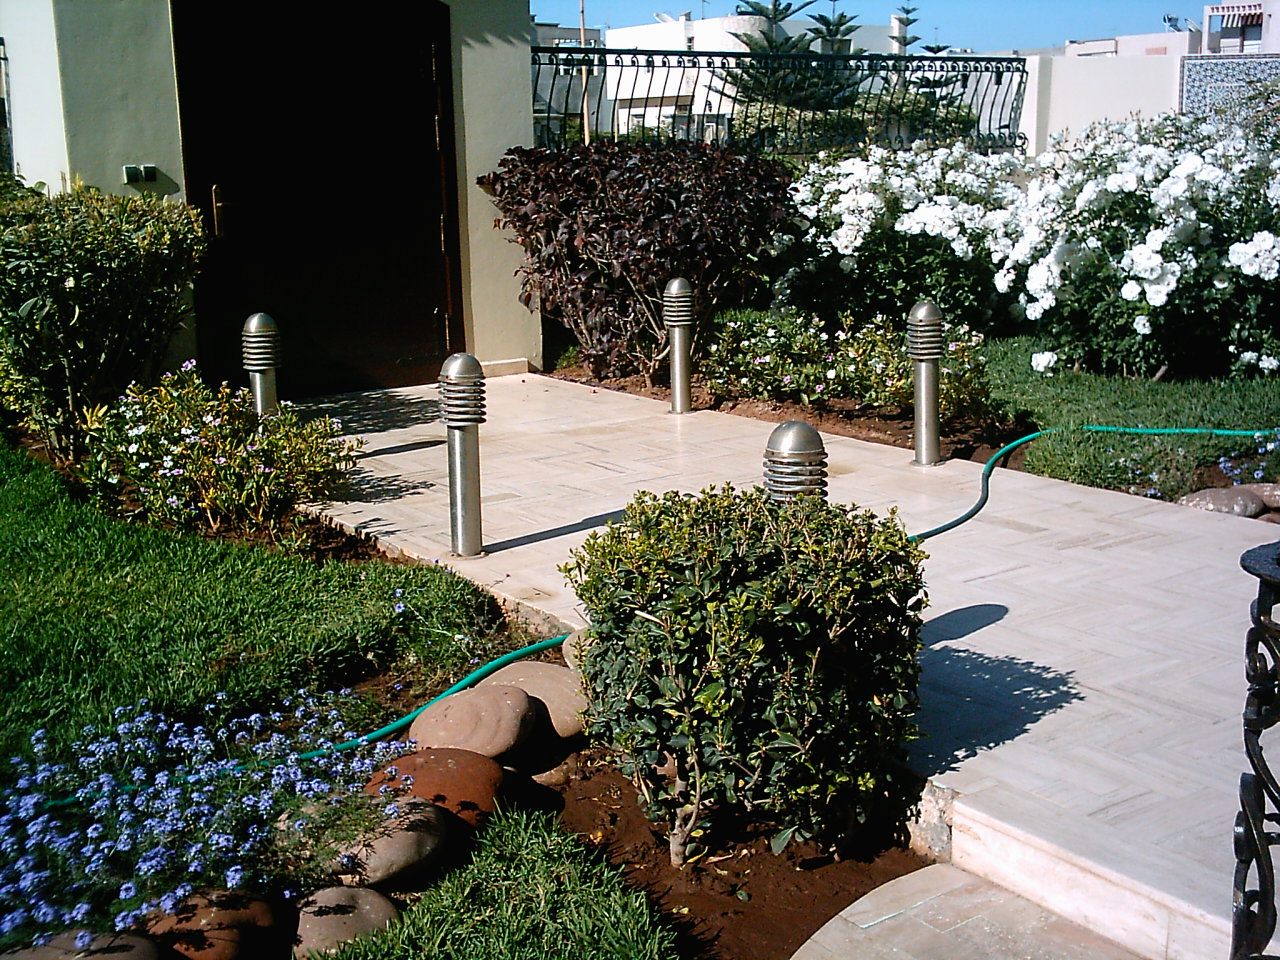 villa louer agadir maroc longue duree location villa agadir pas cher p2. Black Bedroom Furniture Sets. Home Design Ideas